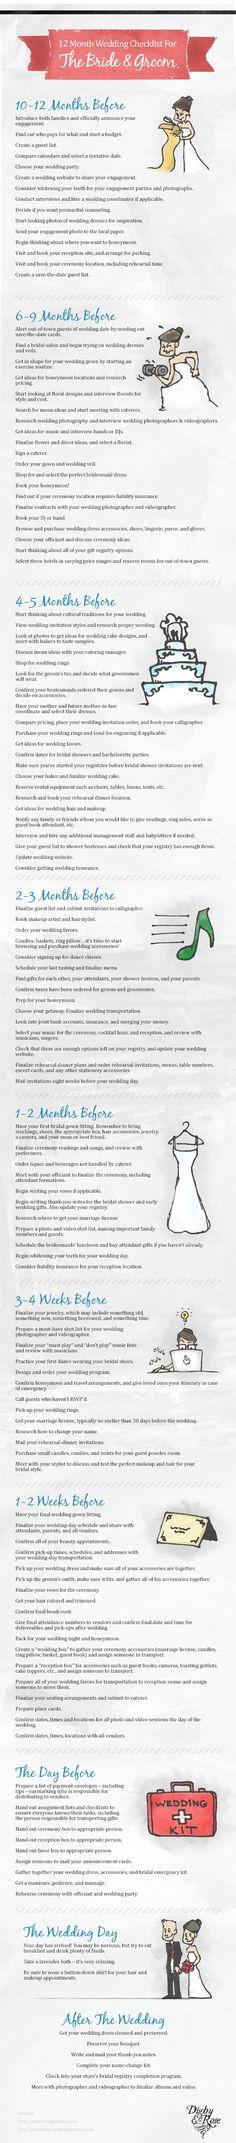 12 Months Complete Checklist Wedding Planning Guide [Infographic]